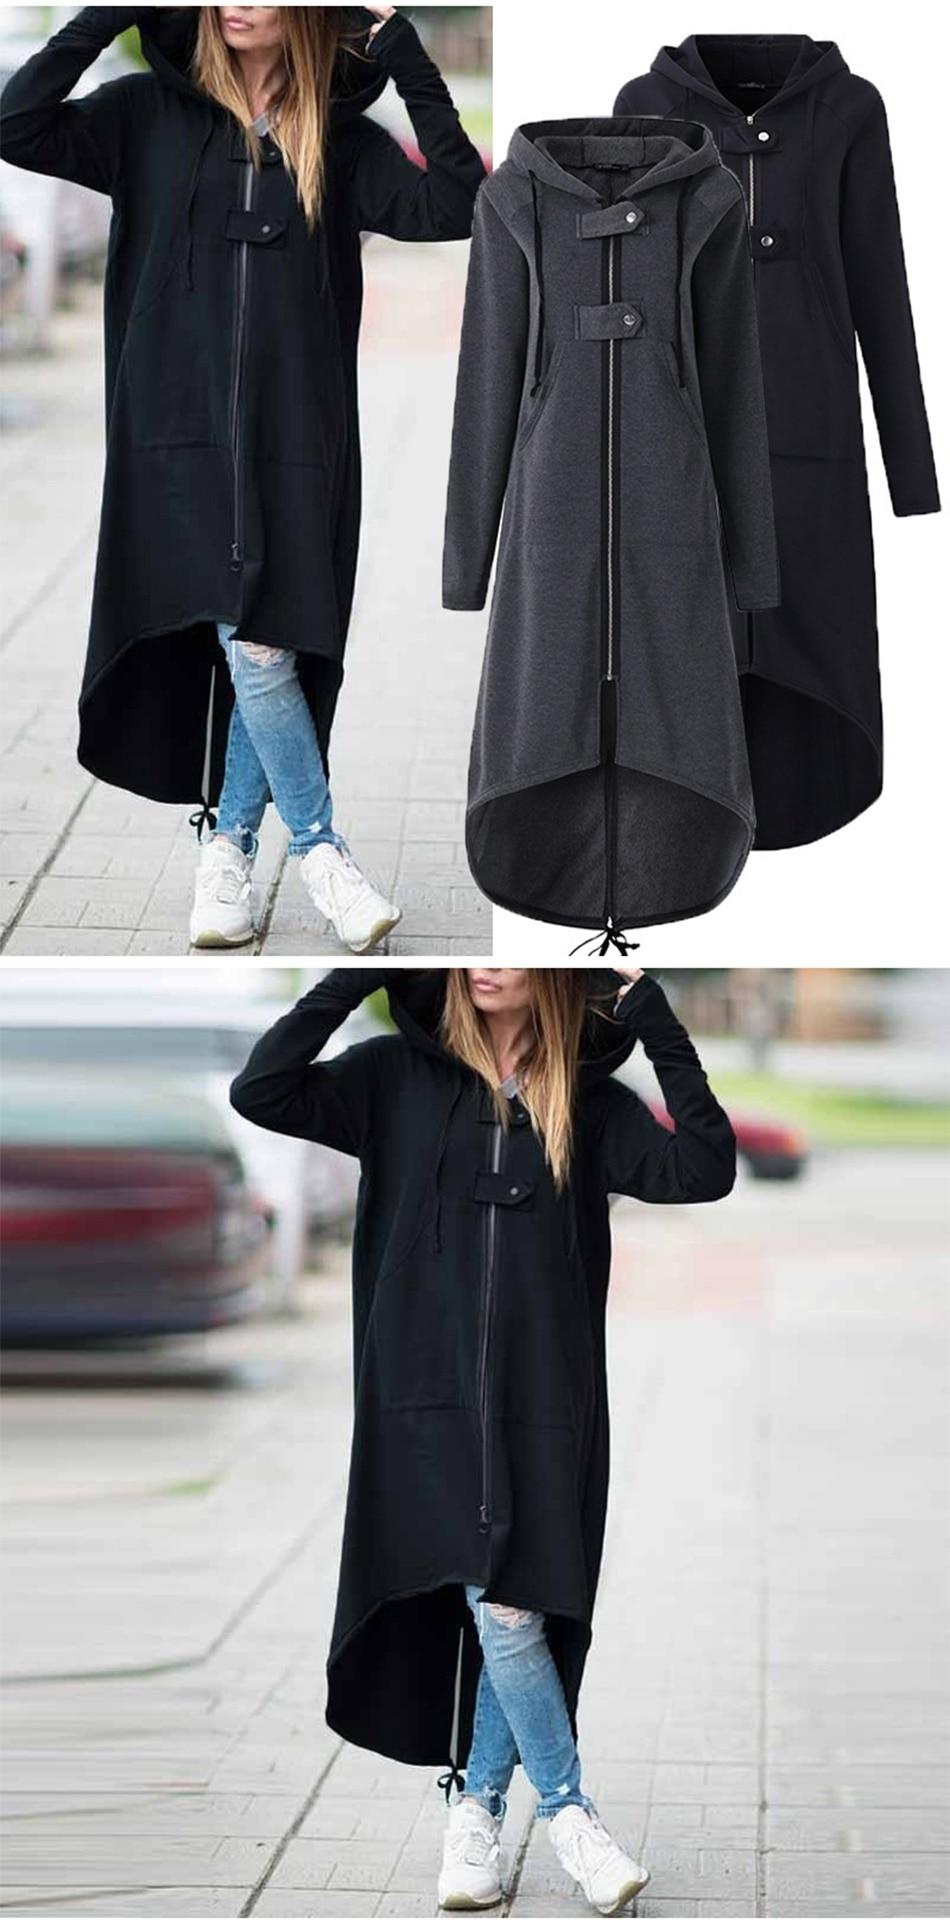 CROPKOP Fashion Long Sleeve Hooded Trench Coat 18 Autumn Black Zipper Plus Size 5XL Velvet Long Coat Women Overcoat Clothes 4